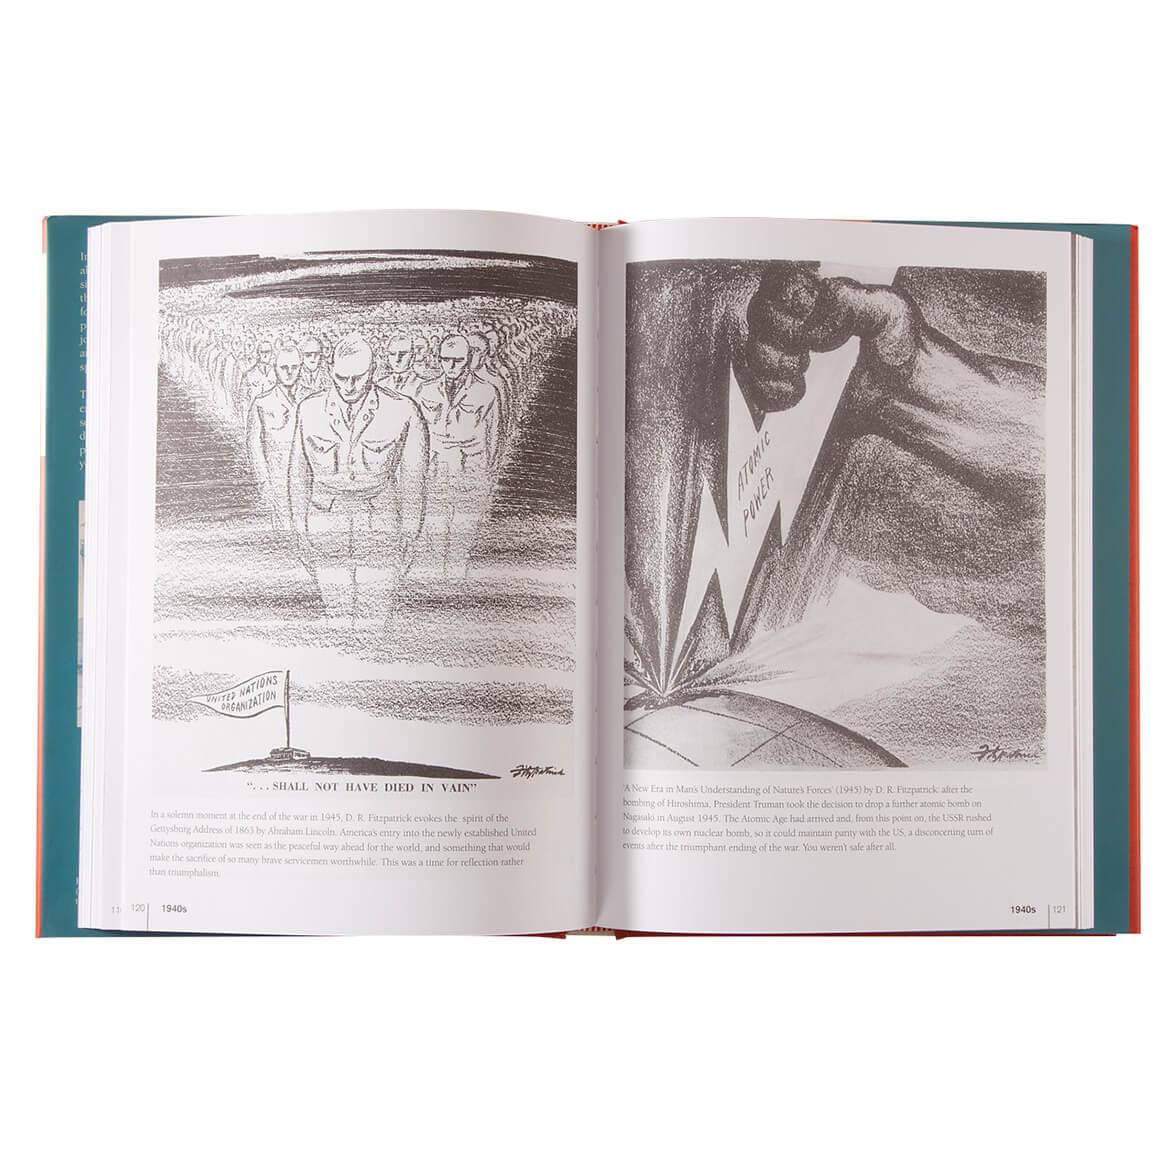 Ideals Springtime Book - Easter Ideals - Ideals Book - Miles Kimball